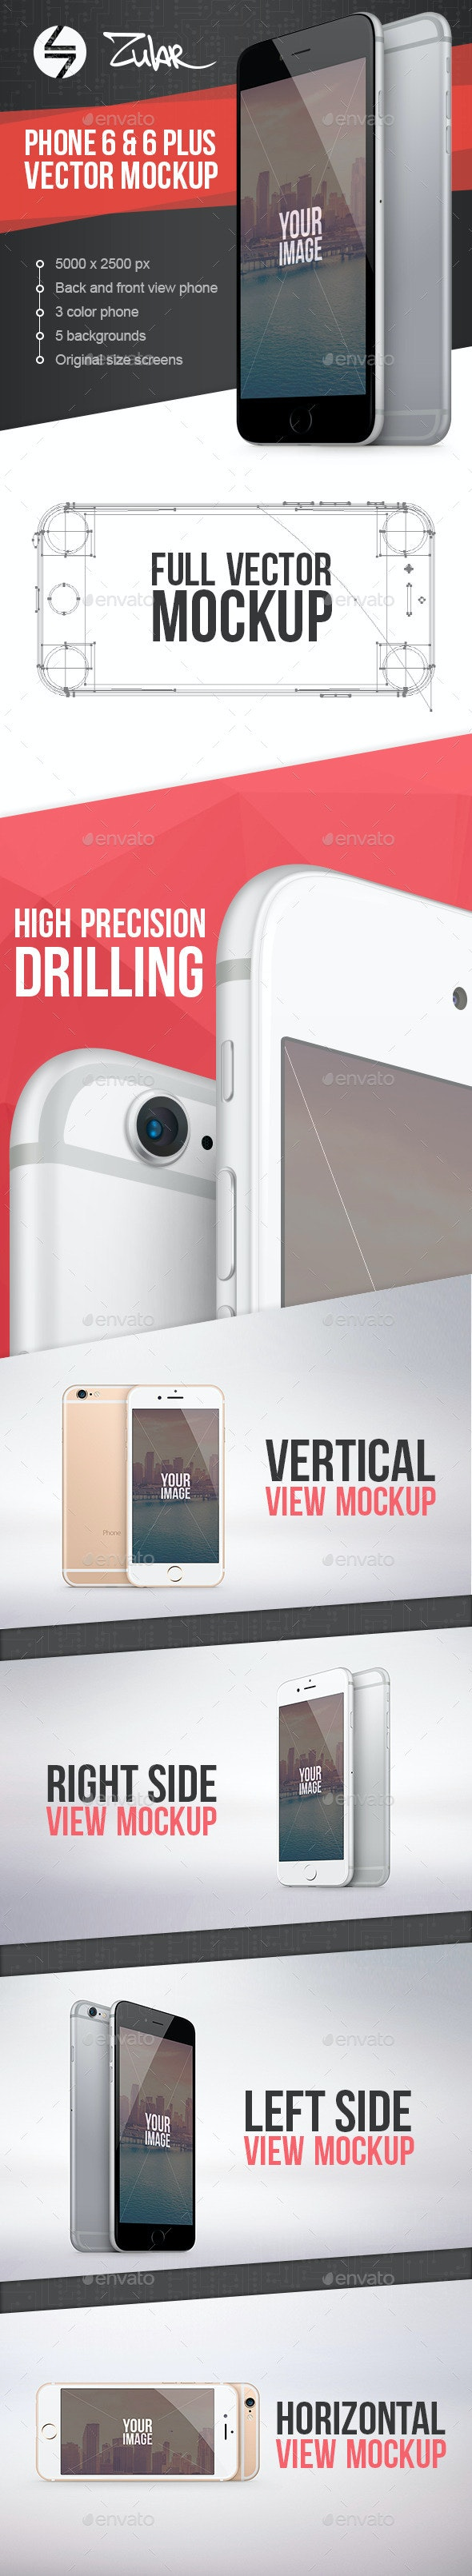 Phone 6 & 6 Plus Vector Mockup - Mobile Displays